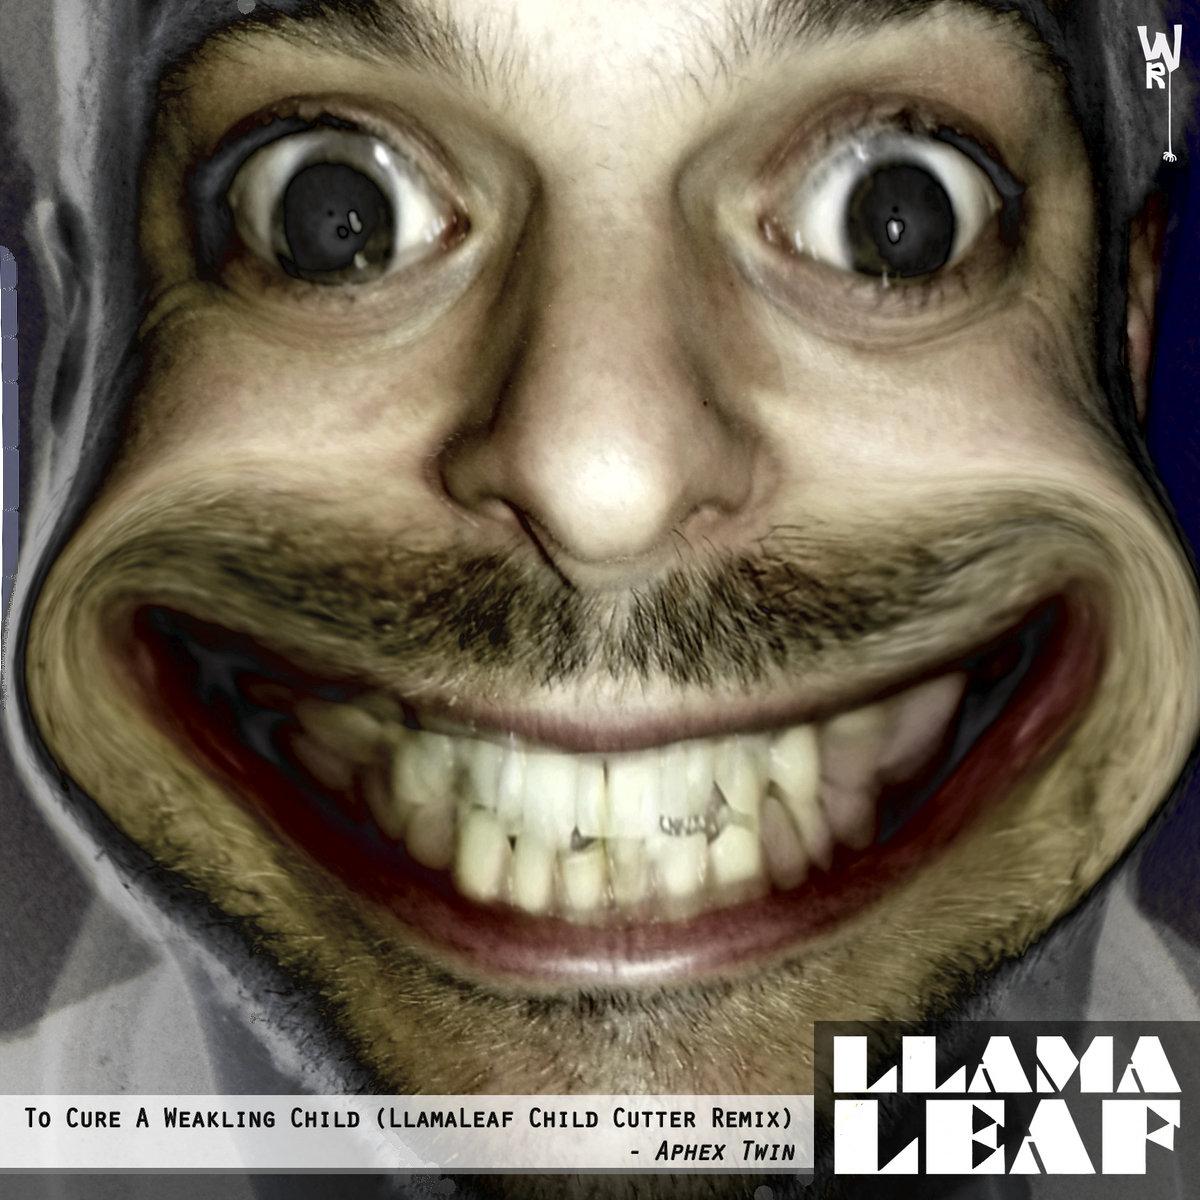 To Cure A Weakling Child Llamaleaf Cutter Remix